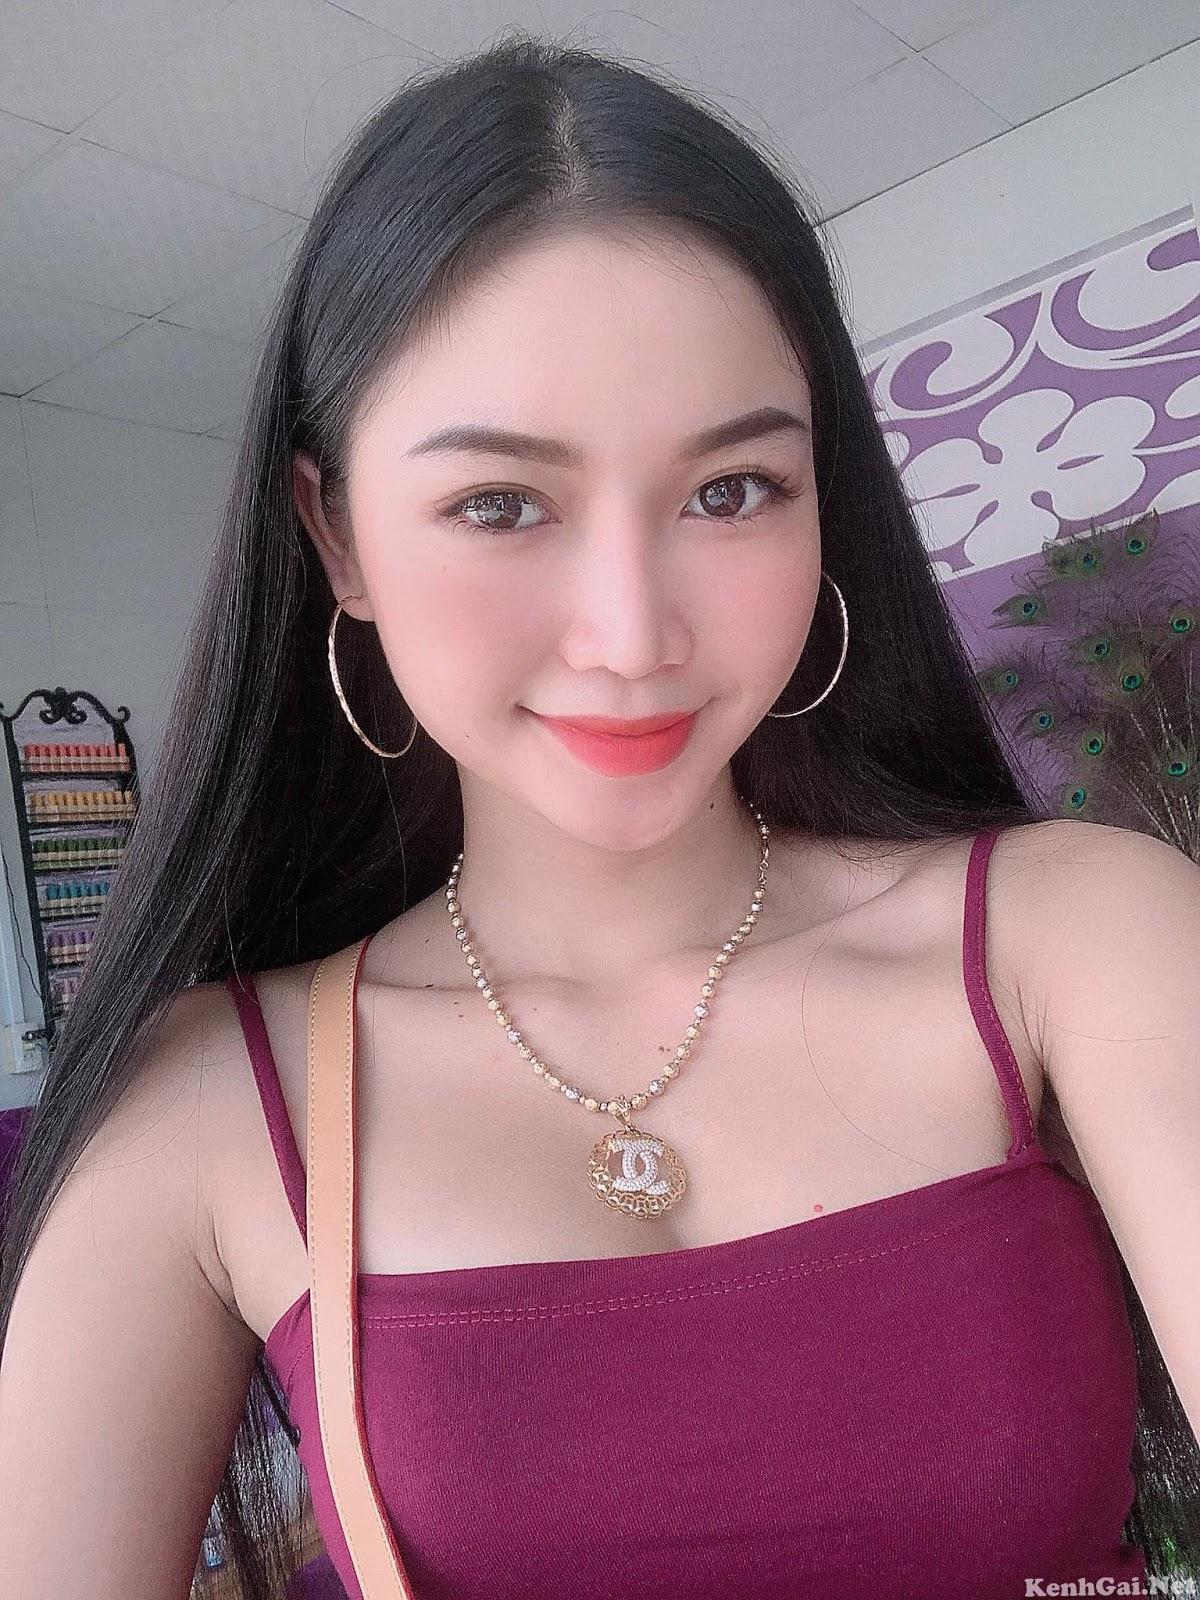 Depvailon.Com: Hotgirl Mercury Nguyễn   E-CUP   Page 1/4